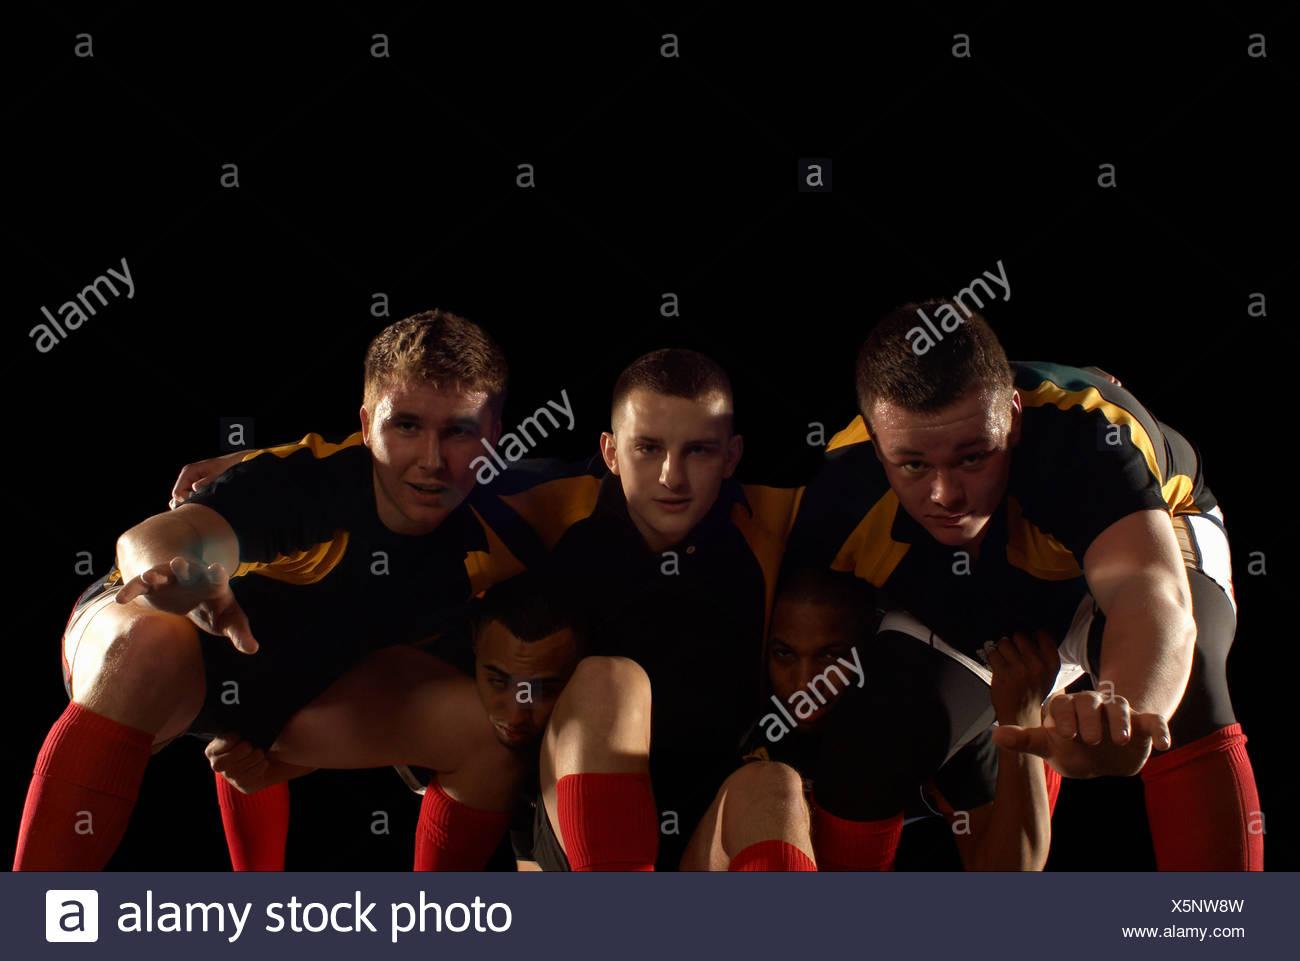 Giocatori di rugby in scrum formazione Immagini Stock